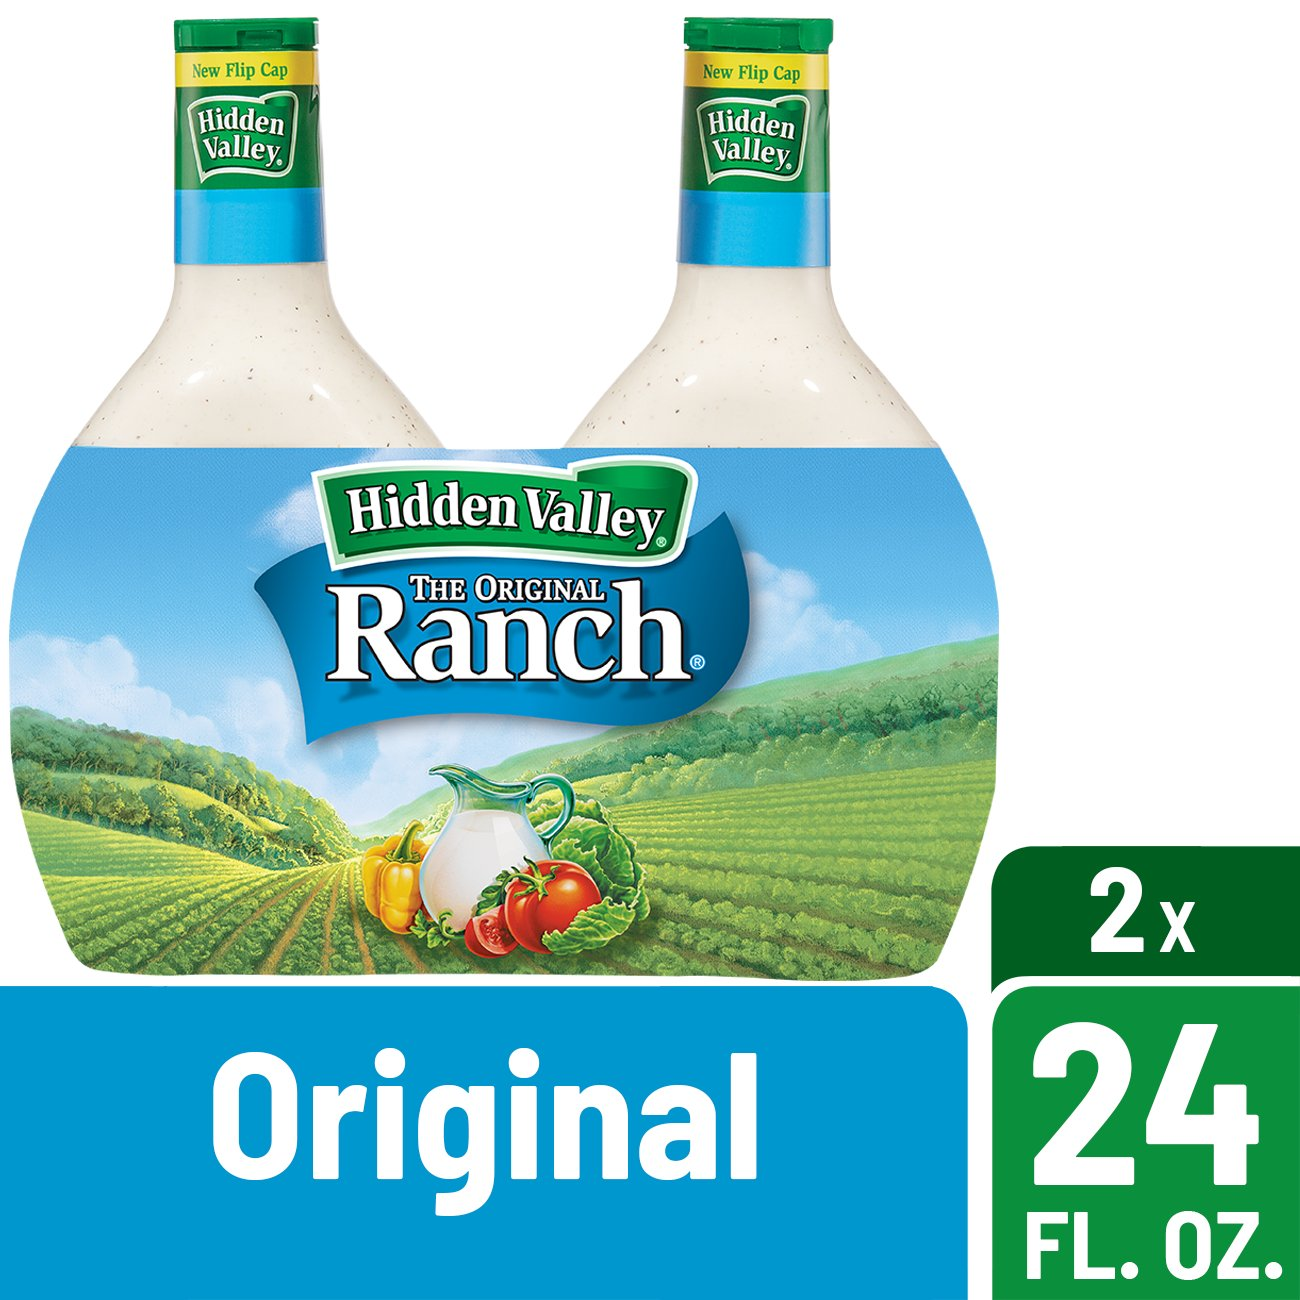 Hidden Valley Original Ranch Salad Dressing & Topping, Gluten Free - 24 oz Bottle - 2 Pack